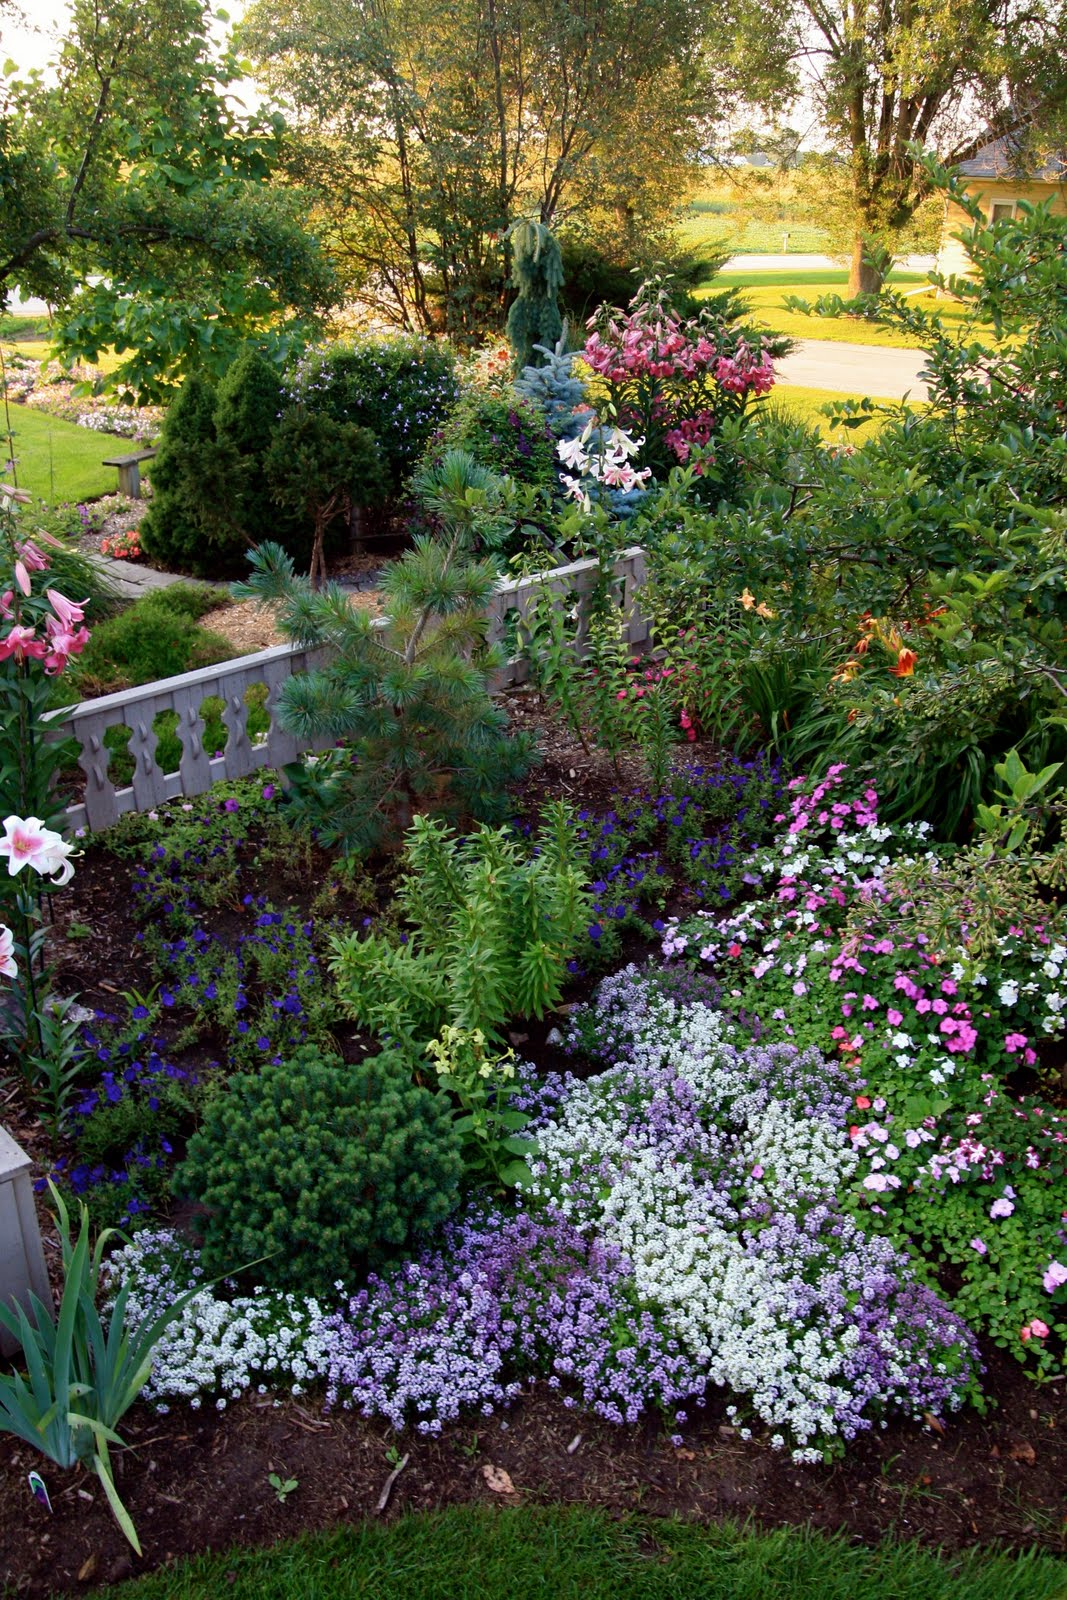 Conrad Art Glass Gardens The Cottage Garden In July